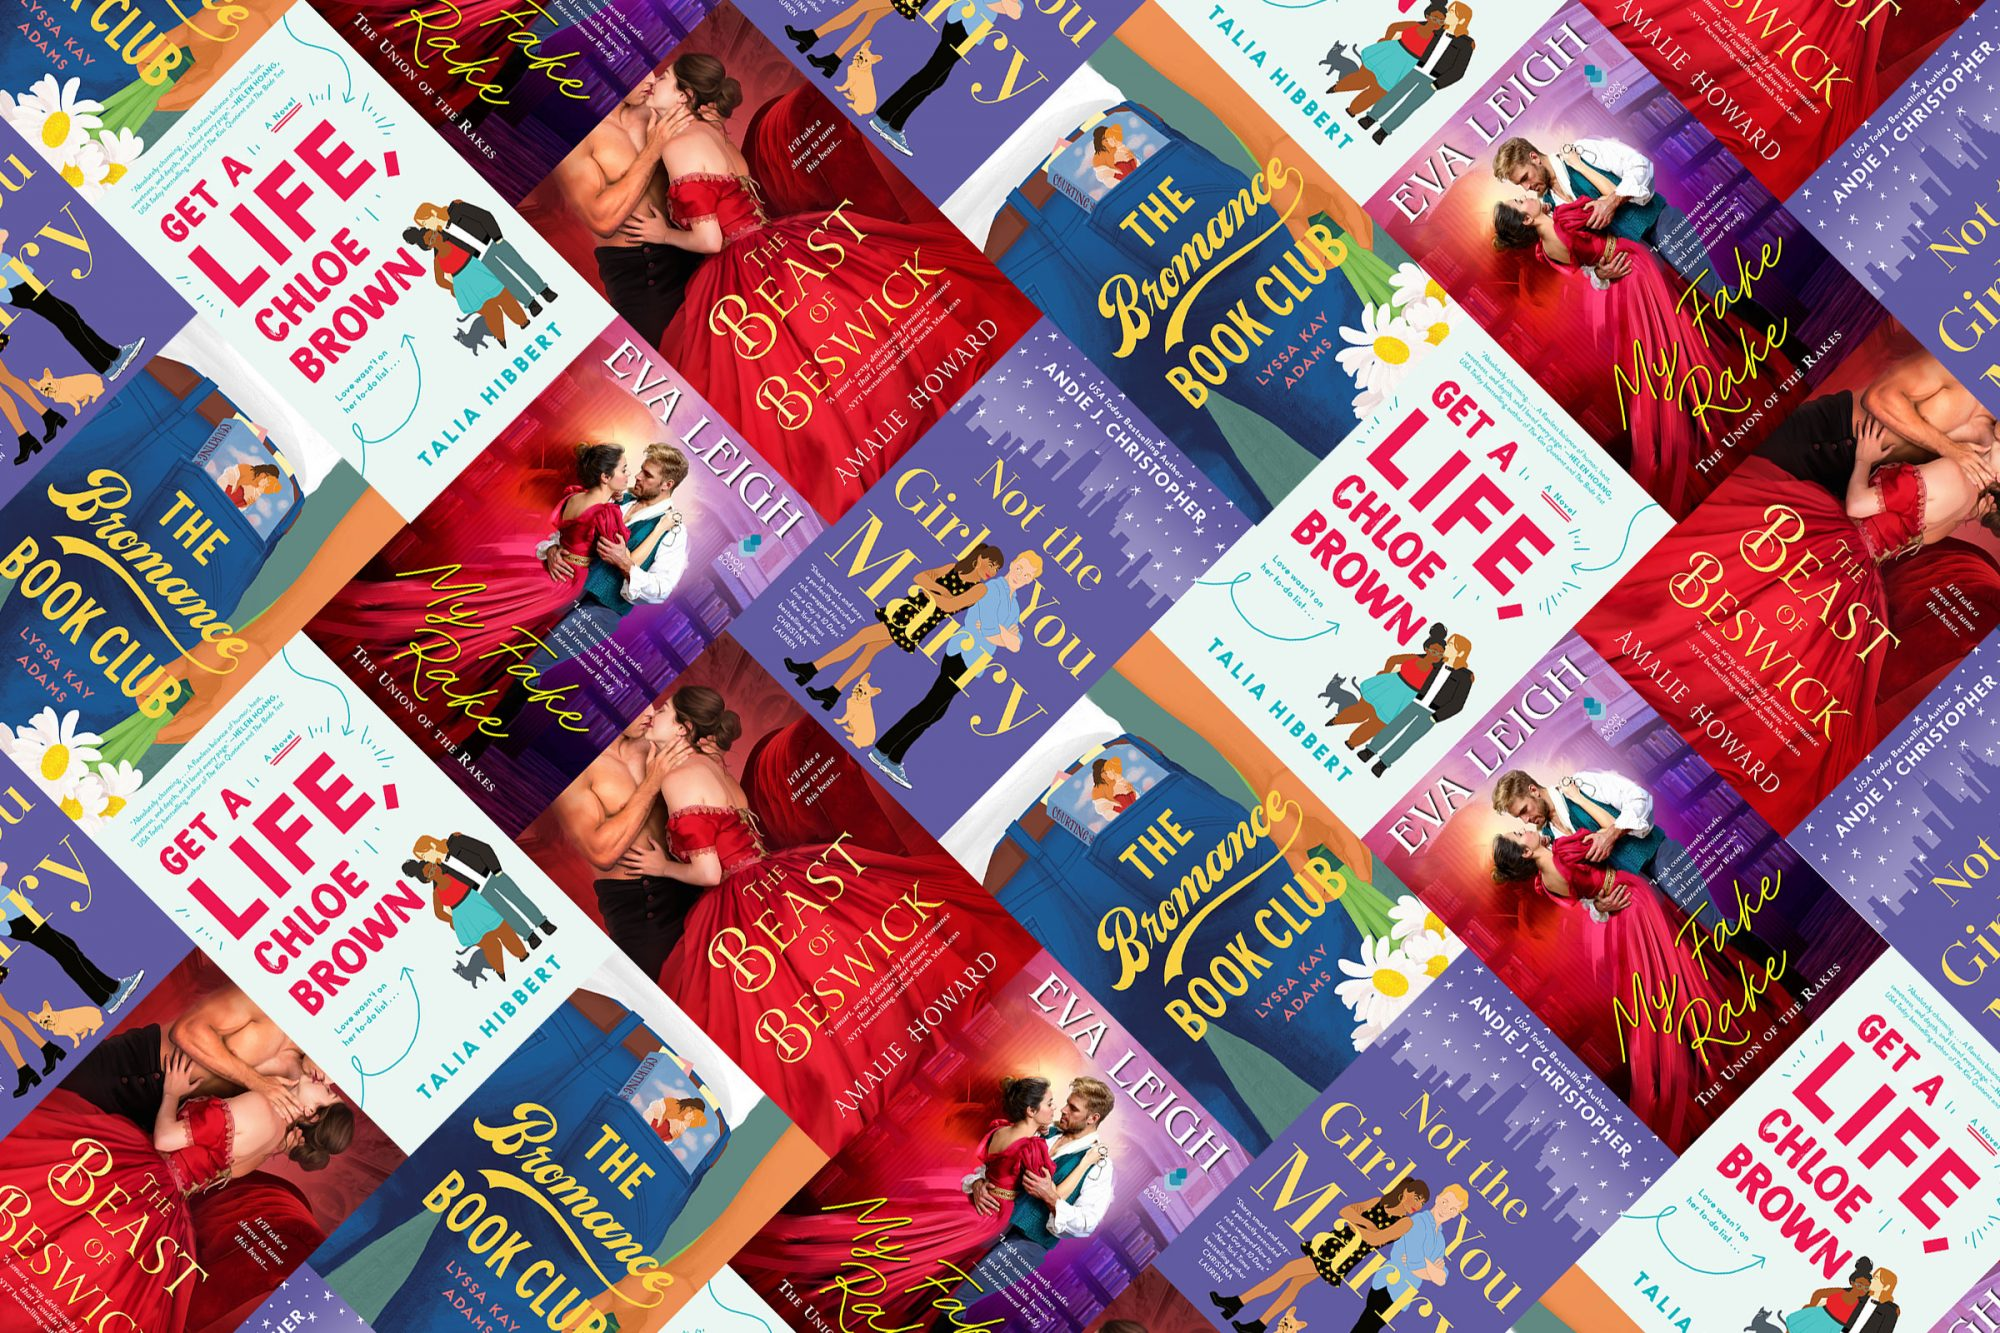 November Romance Novels